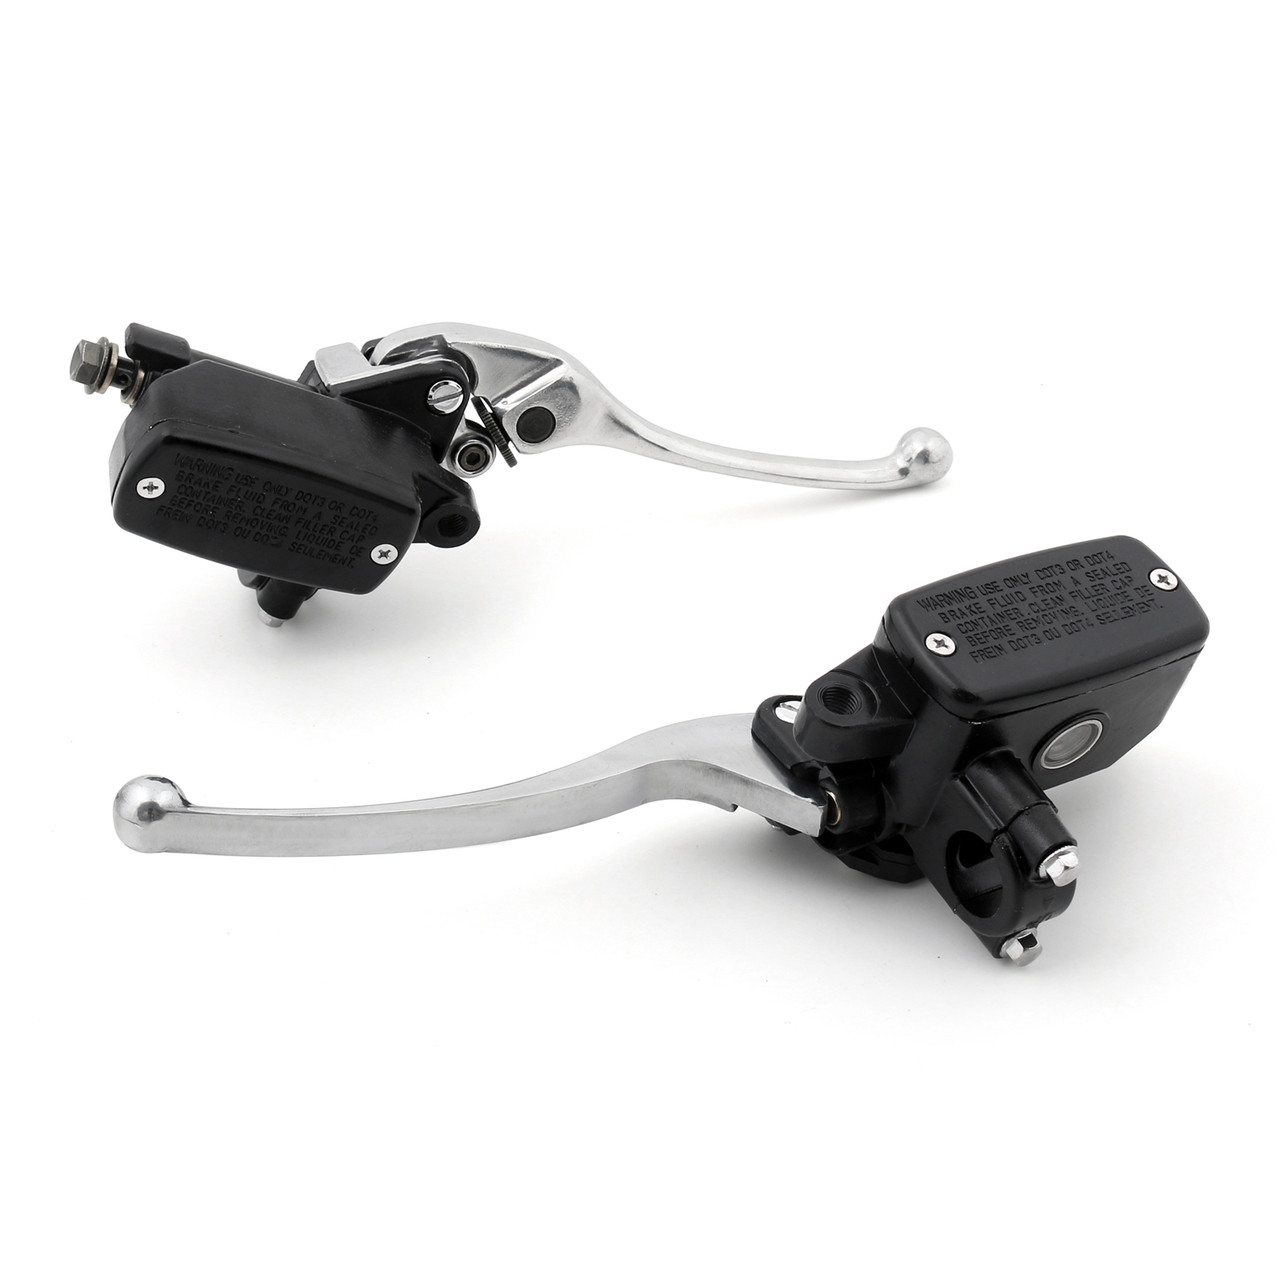 Levers Set Hydraulic Brake Hydraulic Clutch Master Cylinders Honda PC800 (1989-1998) Chrome